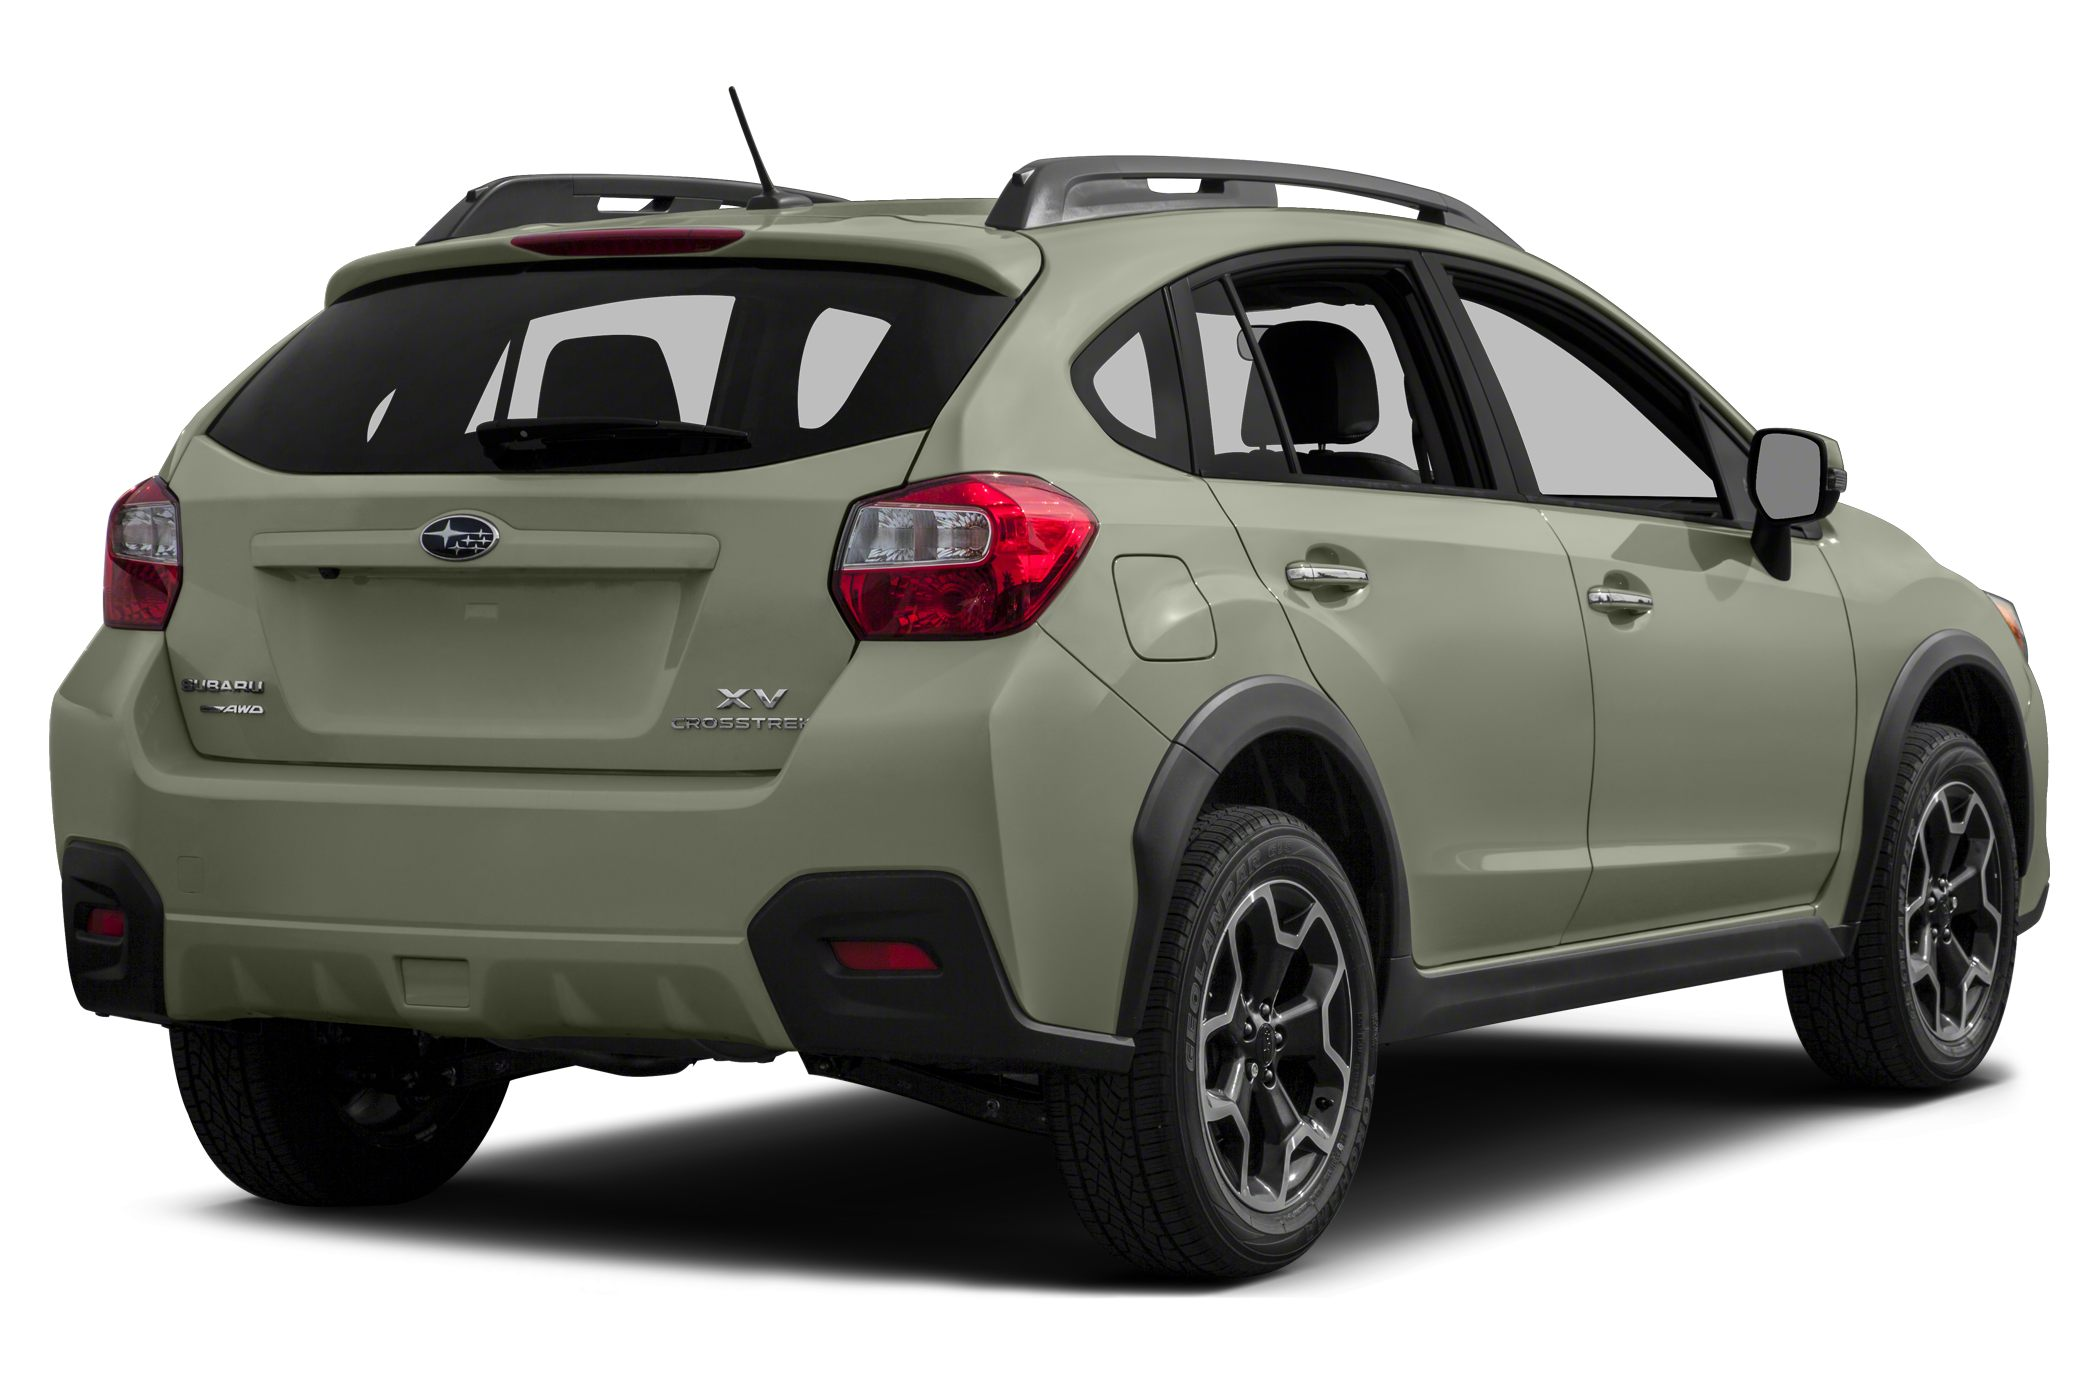 2014 Subaru XV Crosstrek Pictures & Photos - CarsDirect